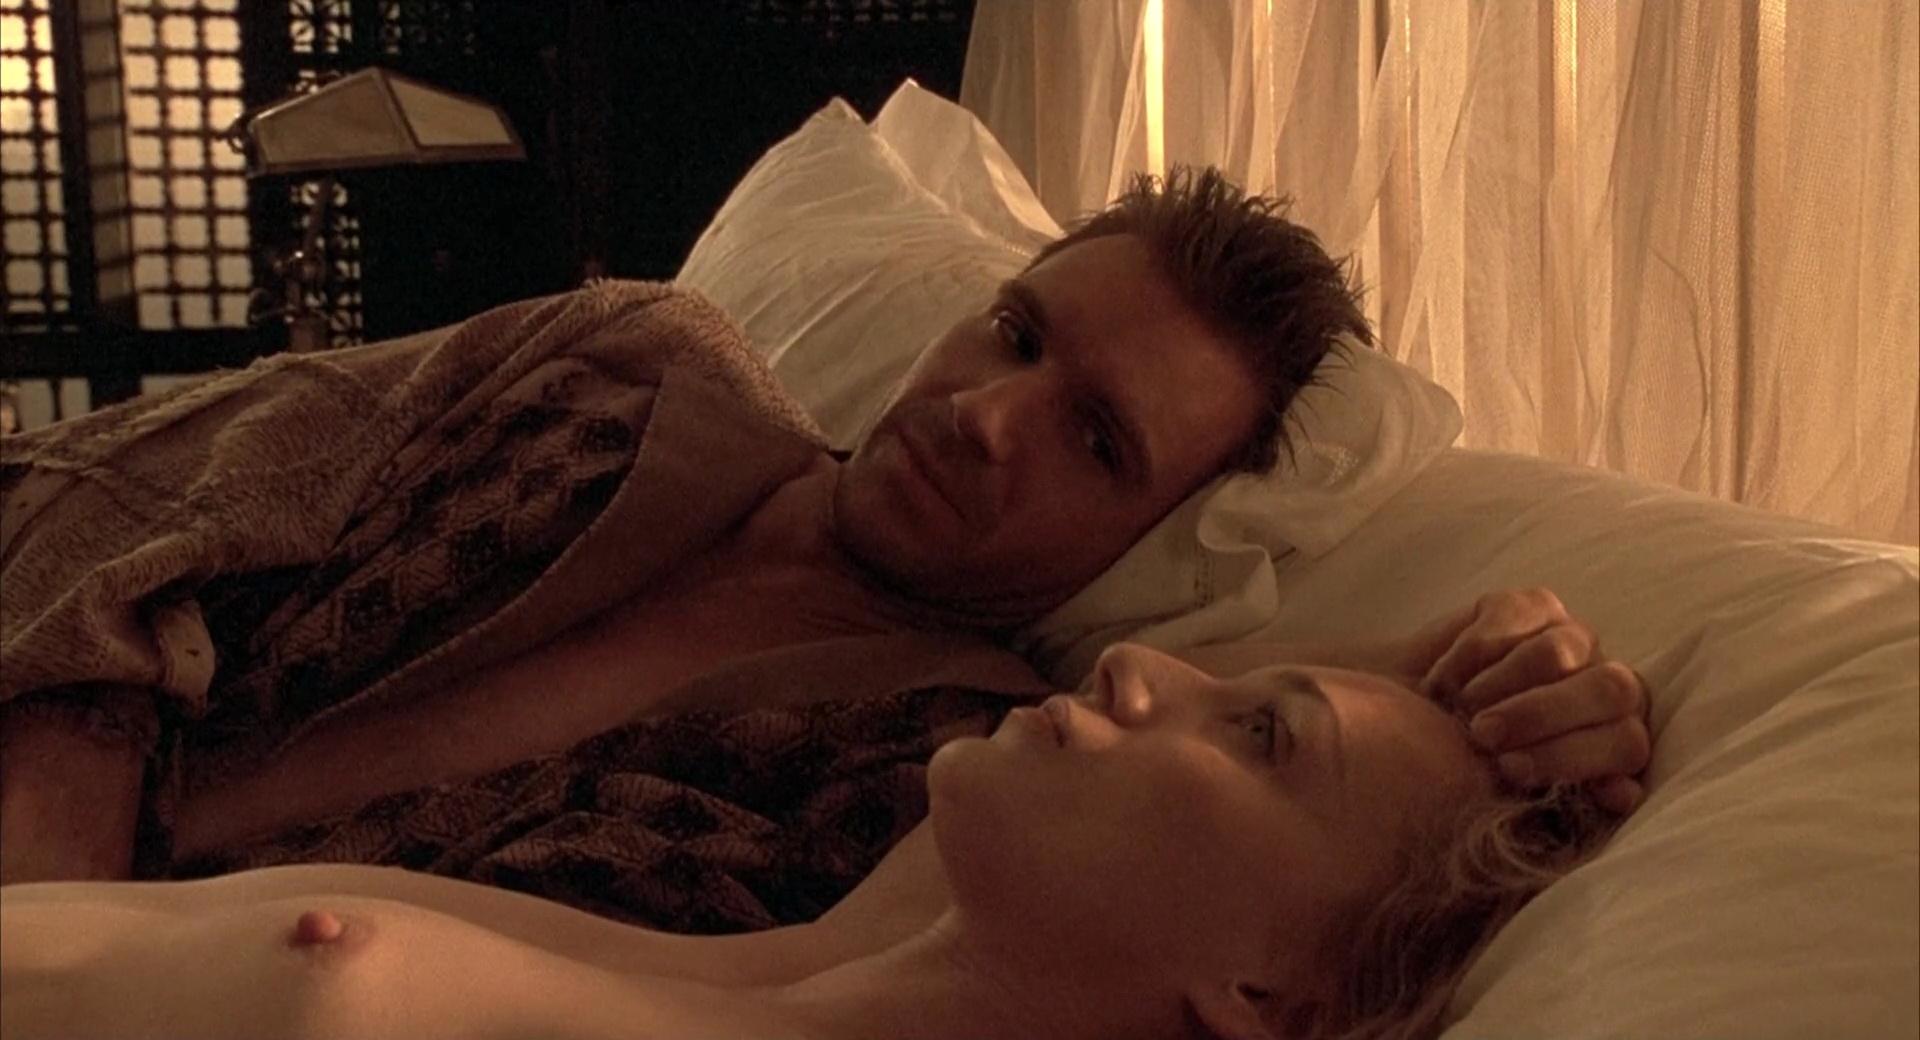 Gratis dejtingsajter sex video porno